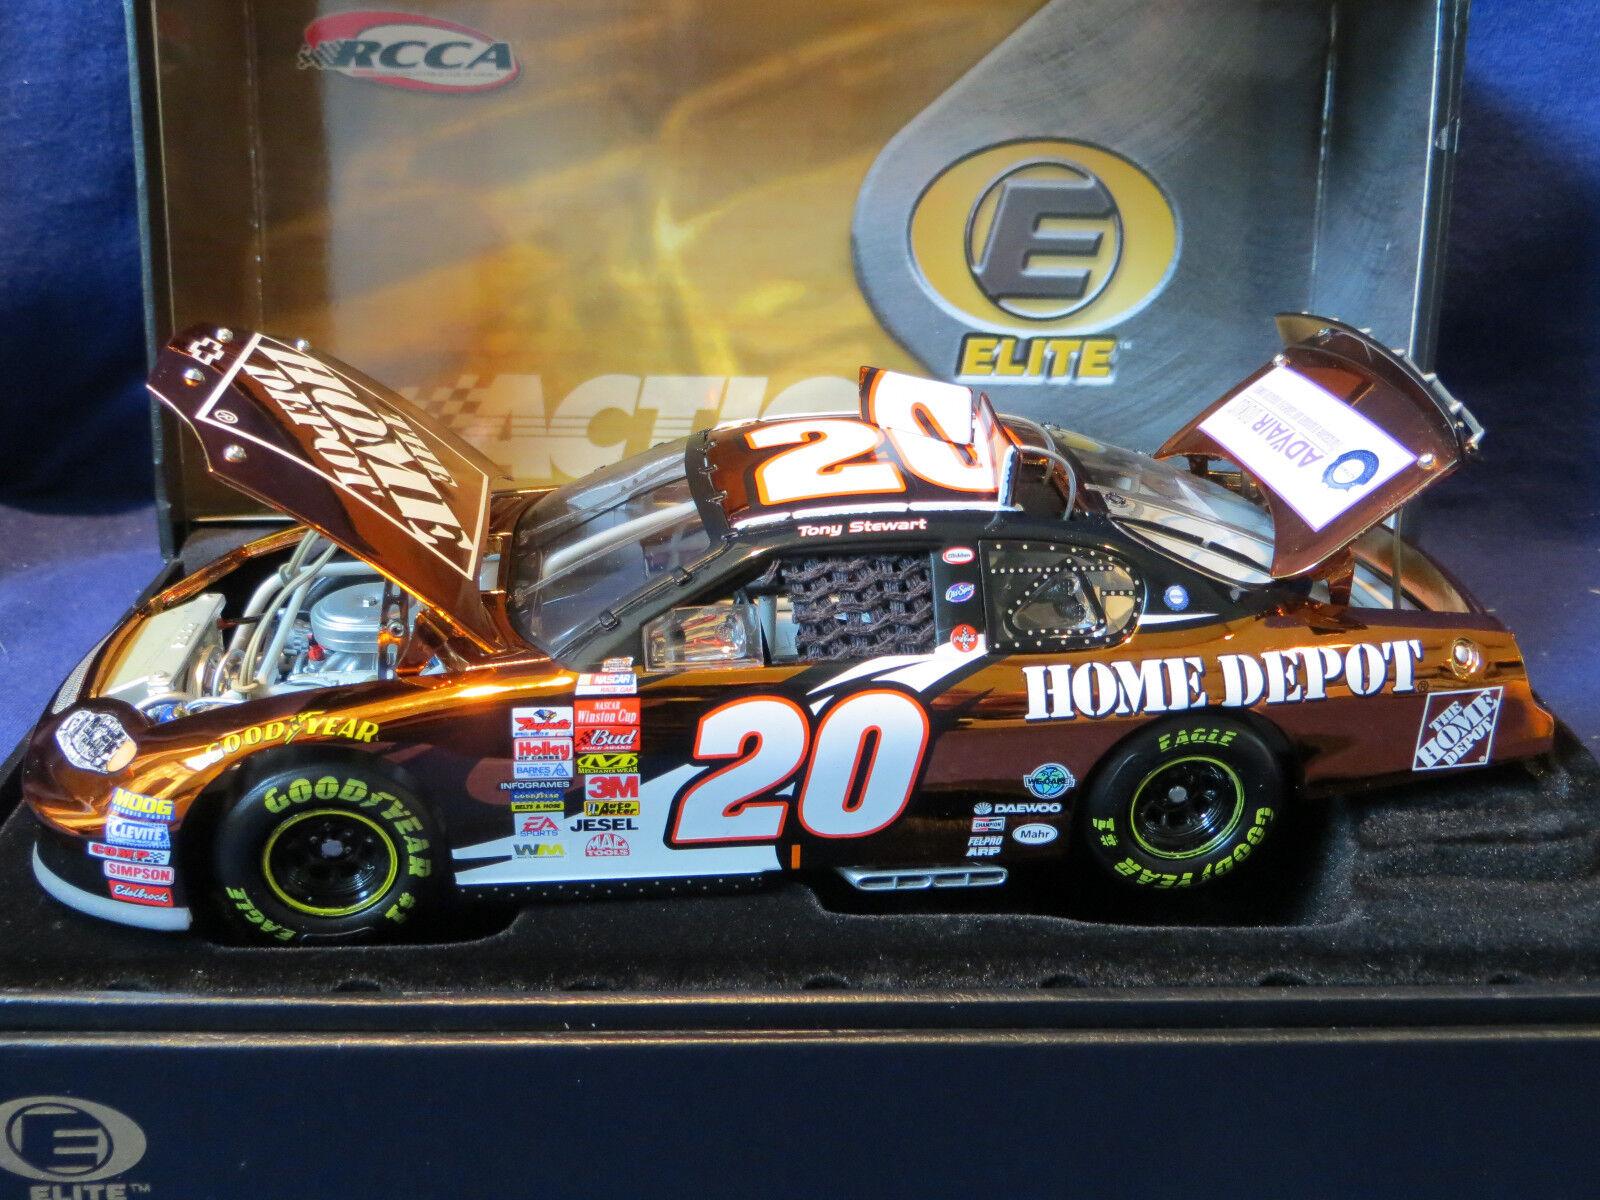 Tony Stewart Home Depot 2003 color color color Chrome Elite  1008 Action RCCA COOL  966b45